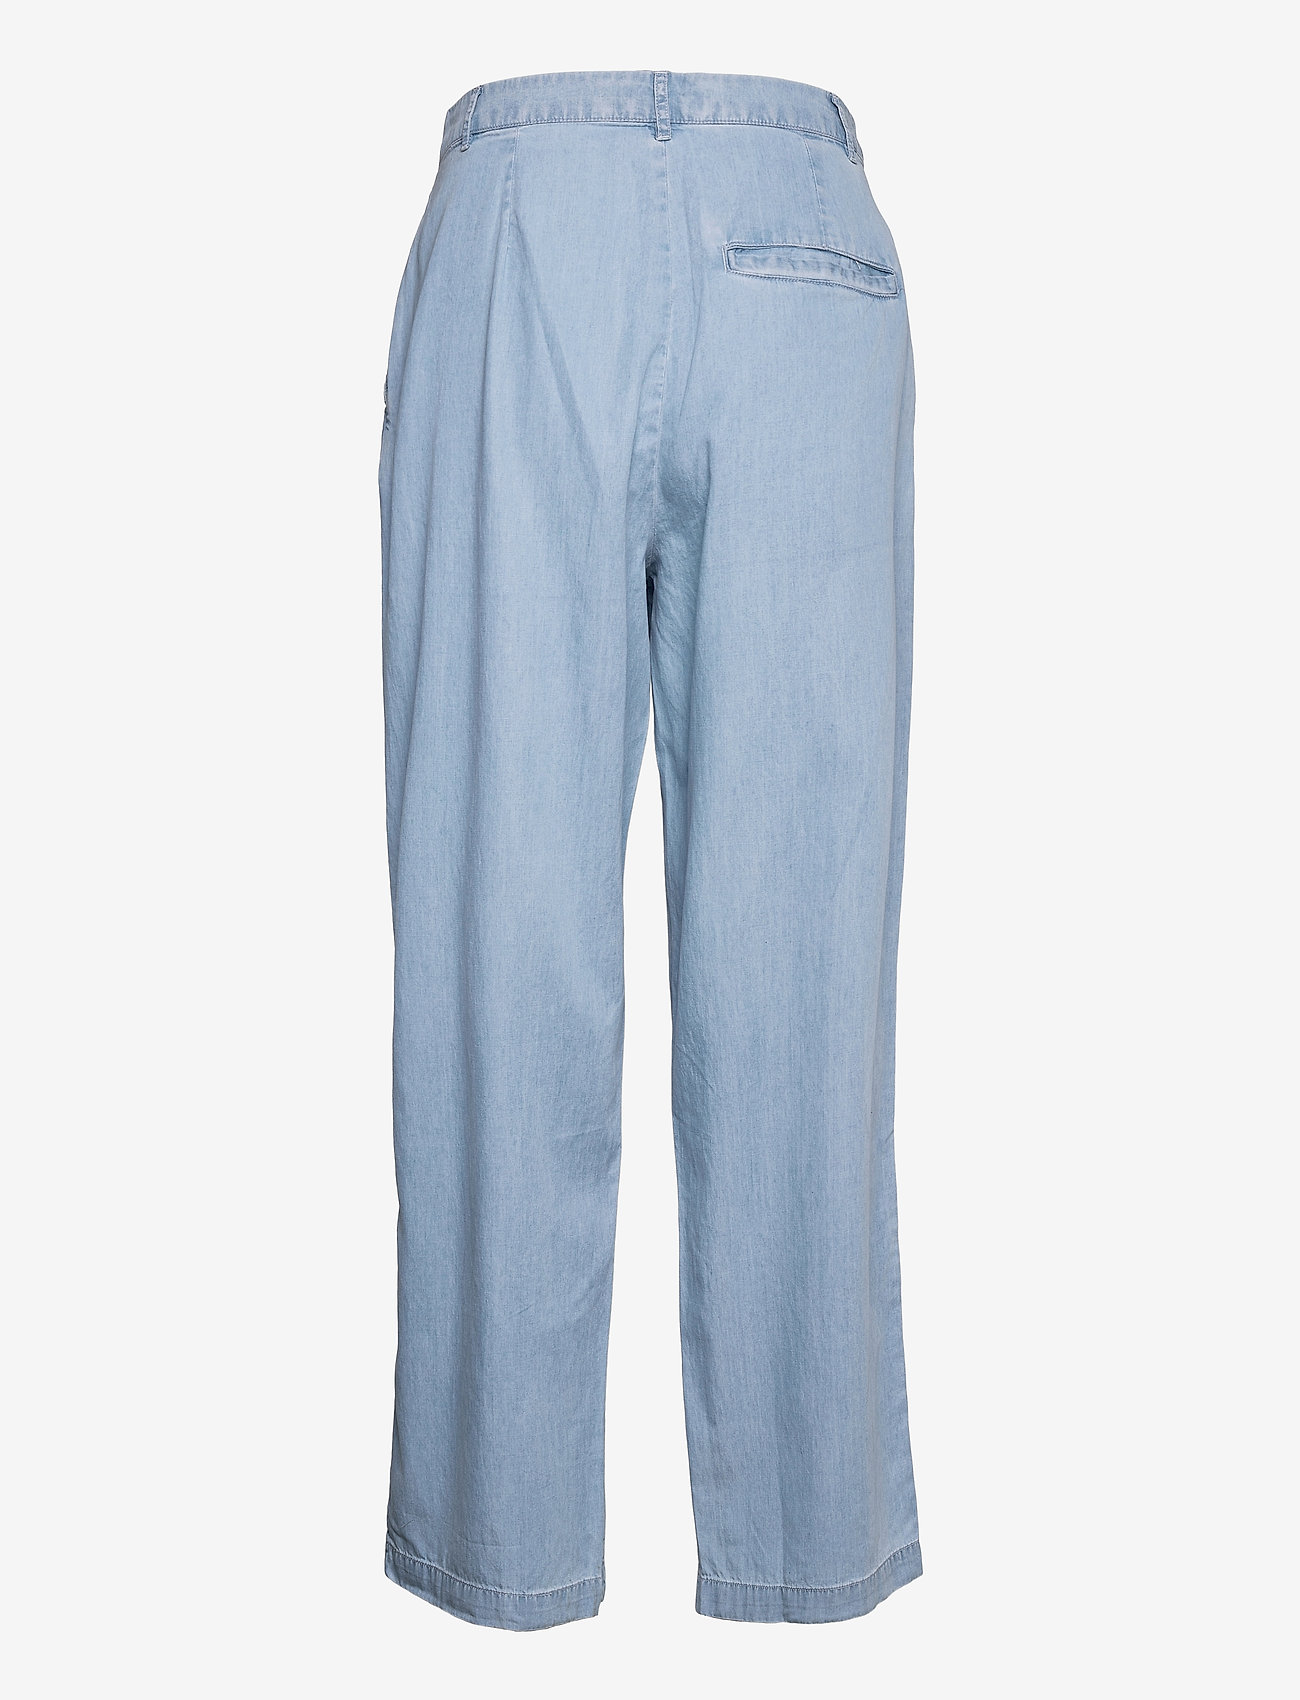 MOSS COPENHAGEN - Flikka Jaina Pants - bukser med brede ben - l blue wash - 1